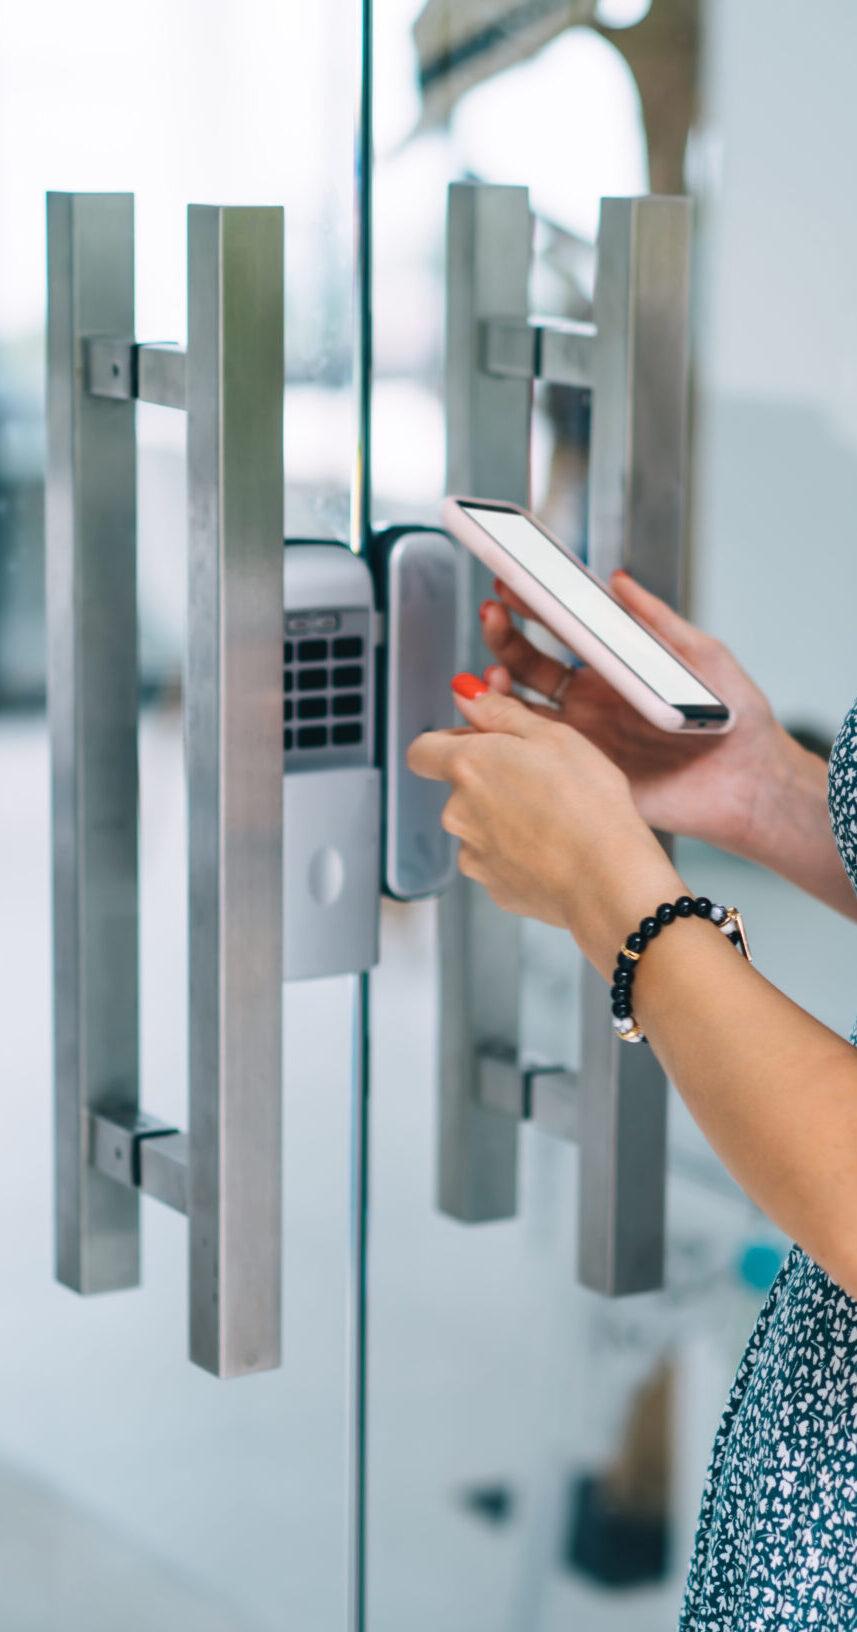 Young female unlocking door by smartphone